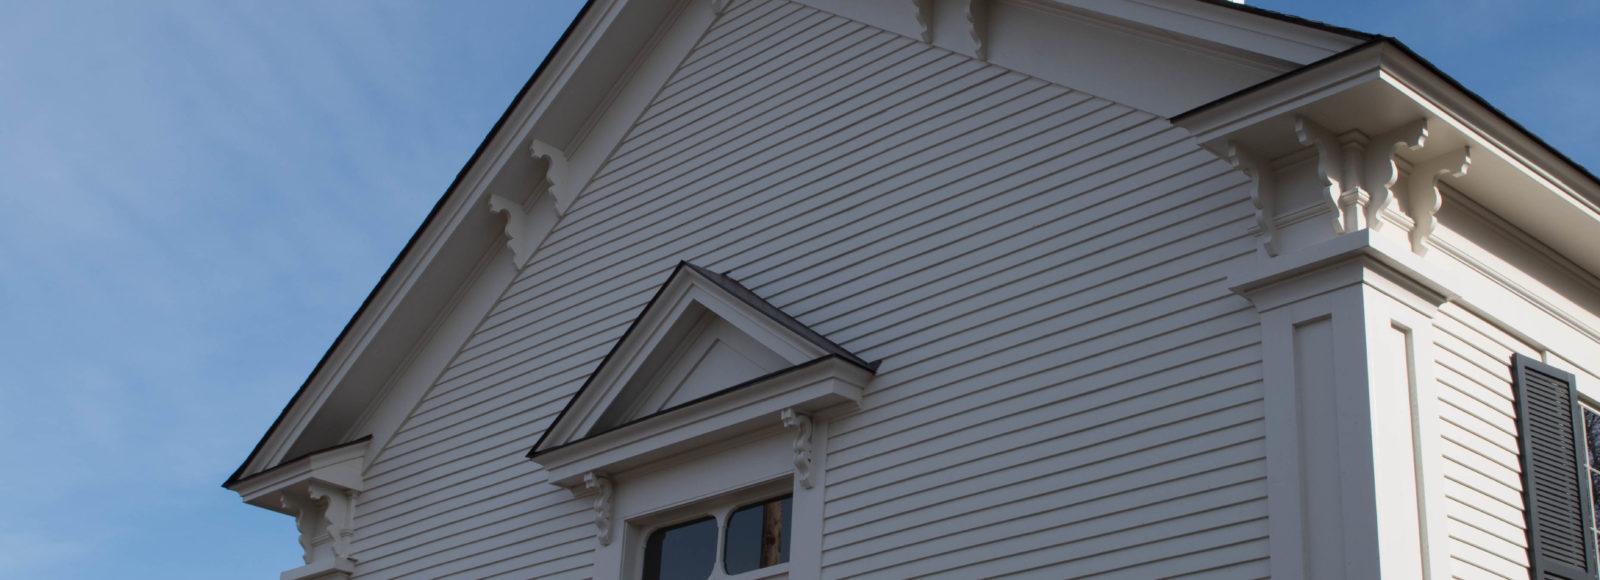 Jim West Central Church Germantown Collierville